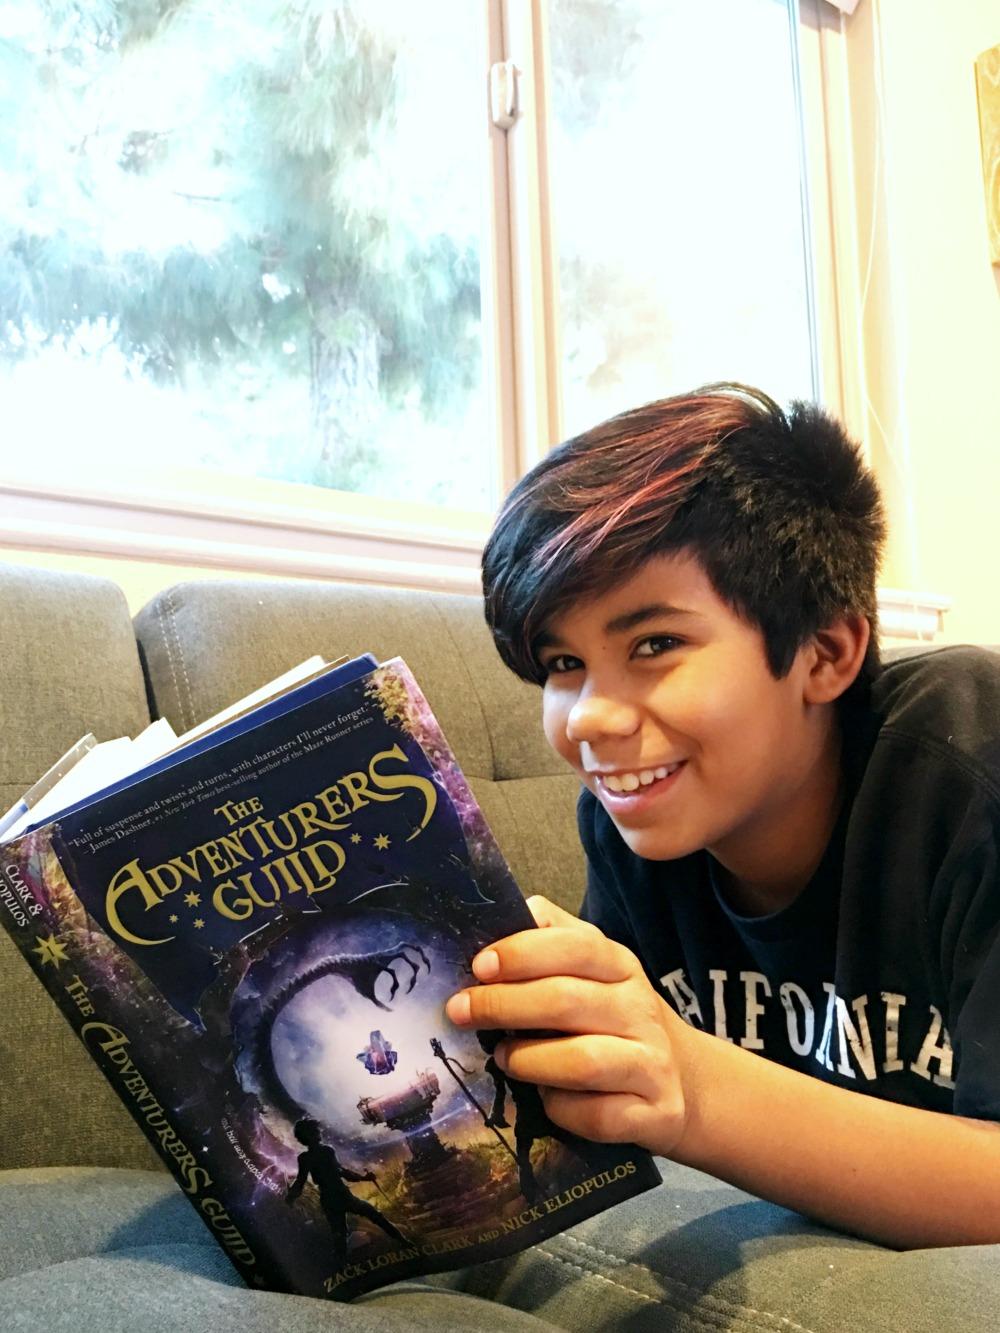 The Adventurers Guild book for young kids - livingmividaloca.com | photo by Pattie Cordova